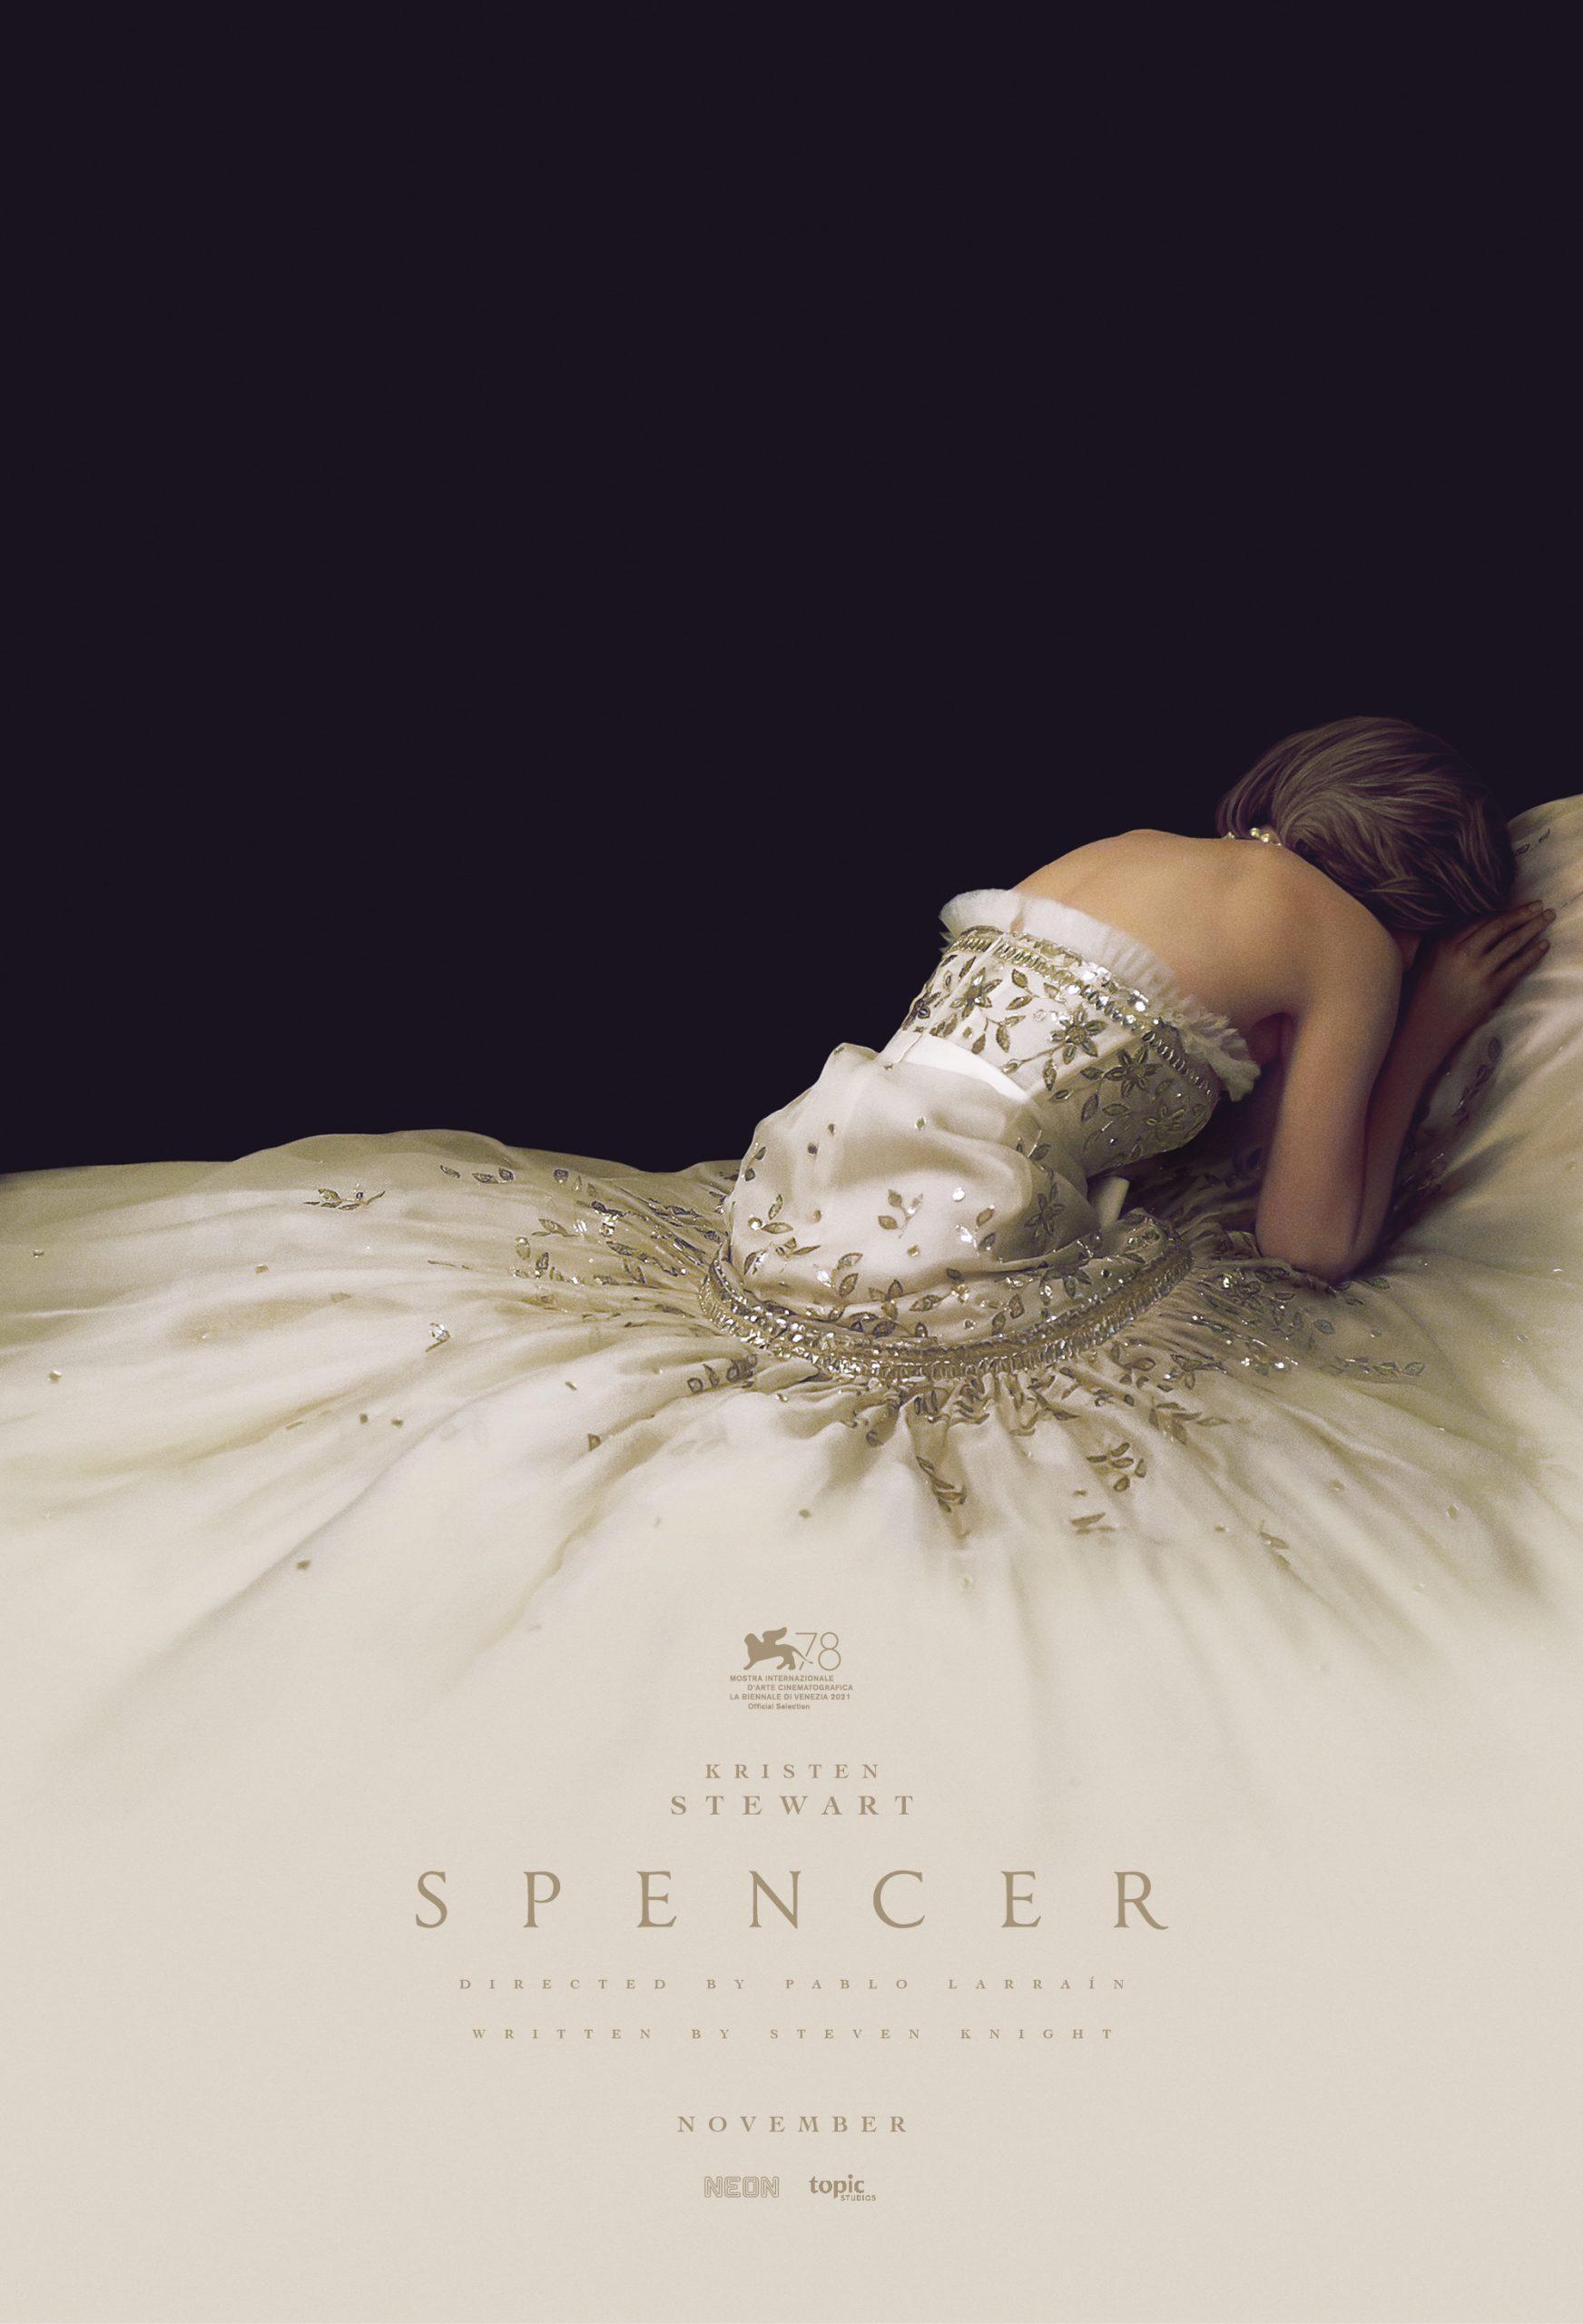 spencer-poster